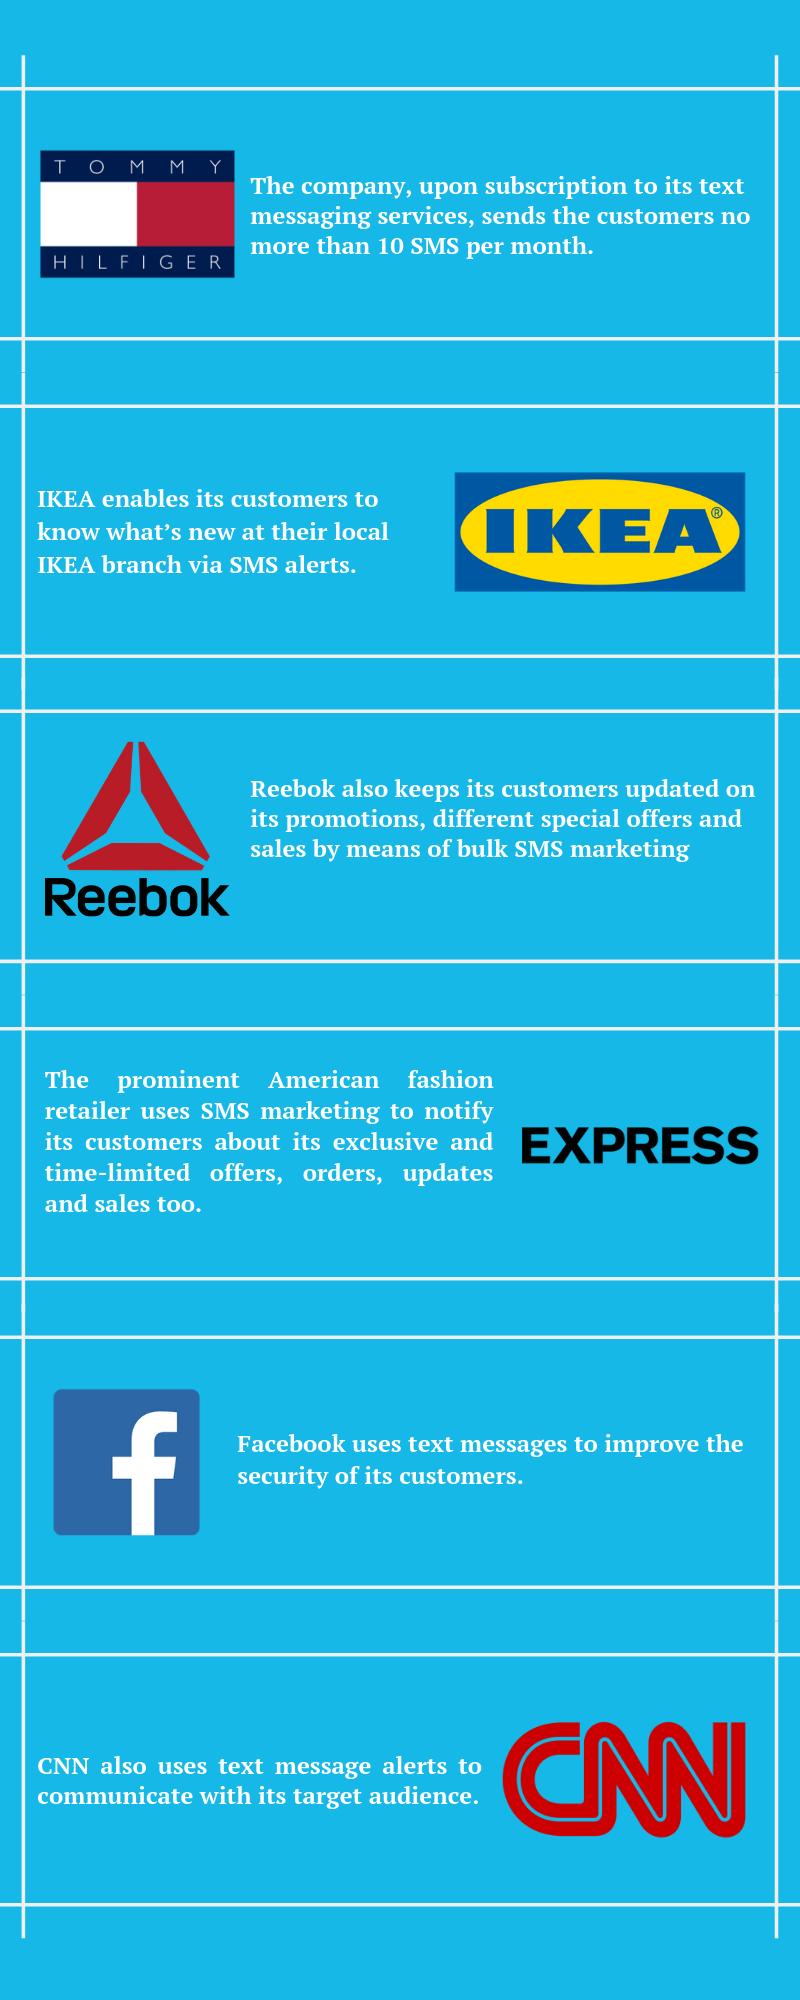 Big brands use SMS marketing